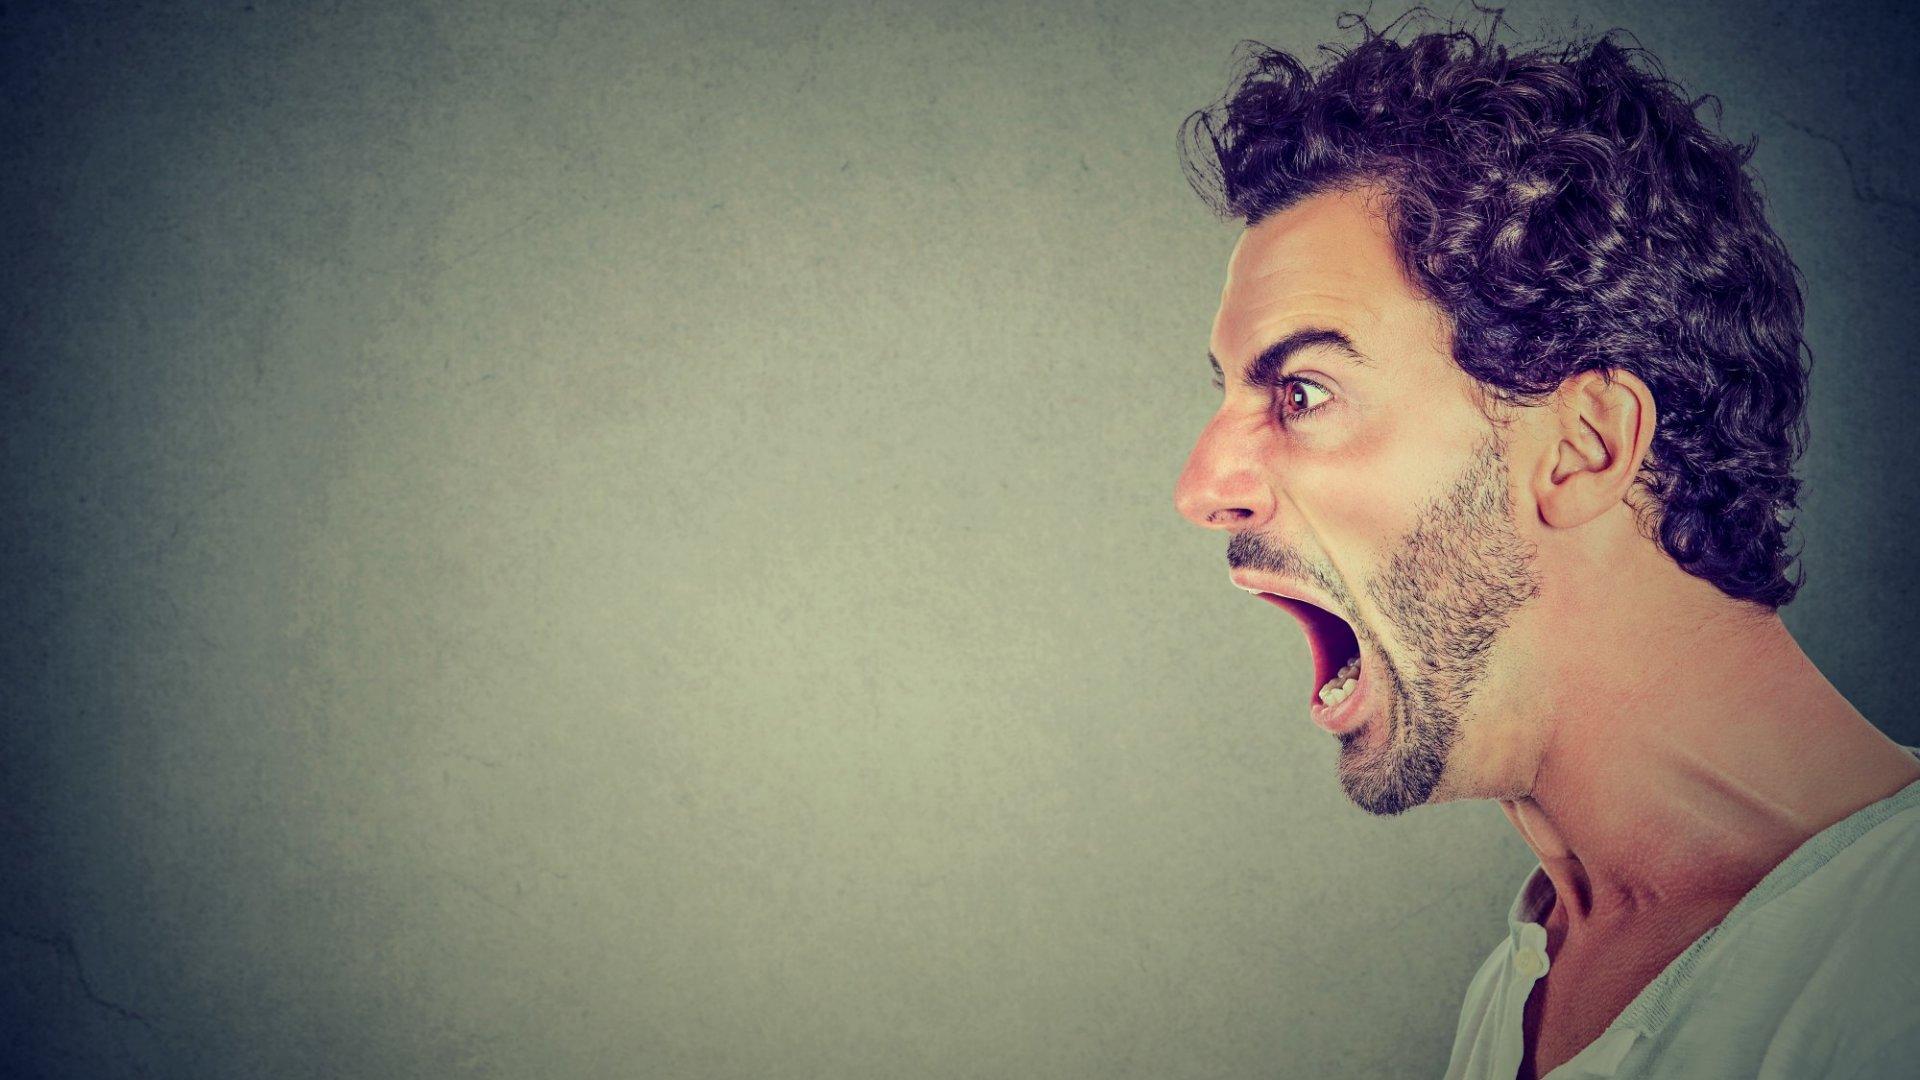 How to Respond vs. React